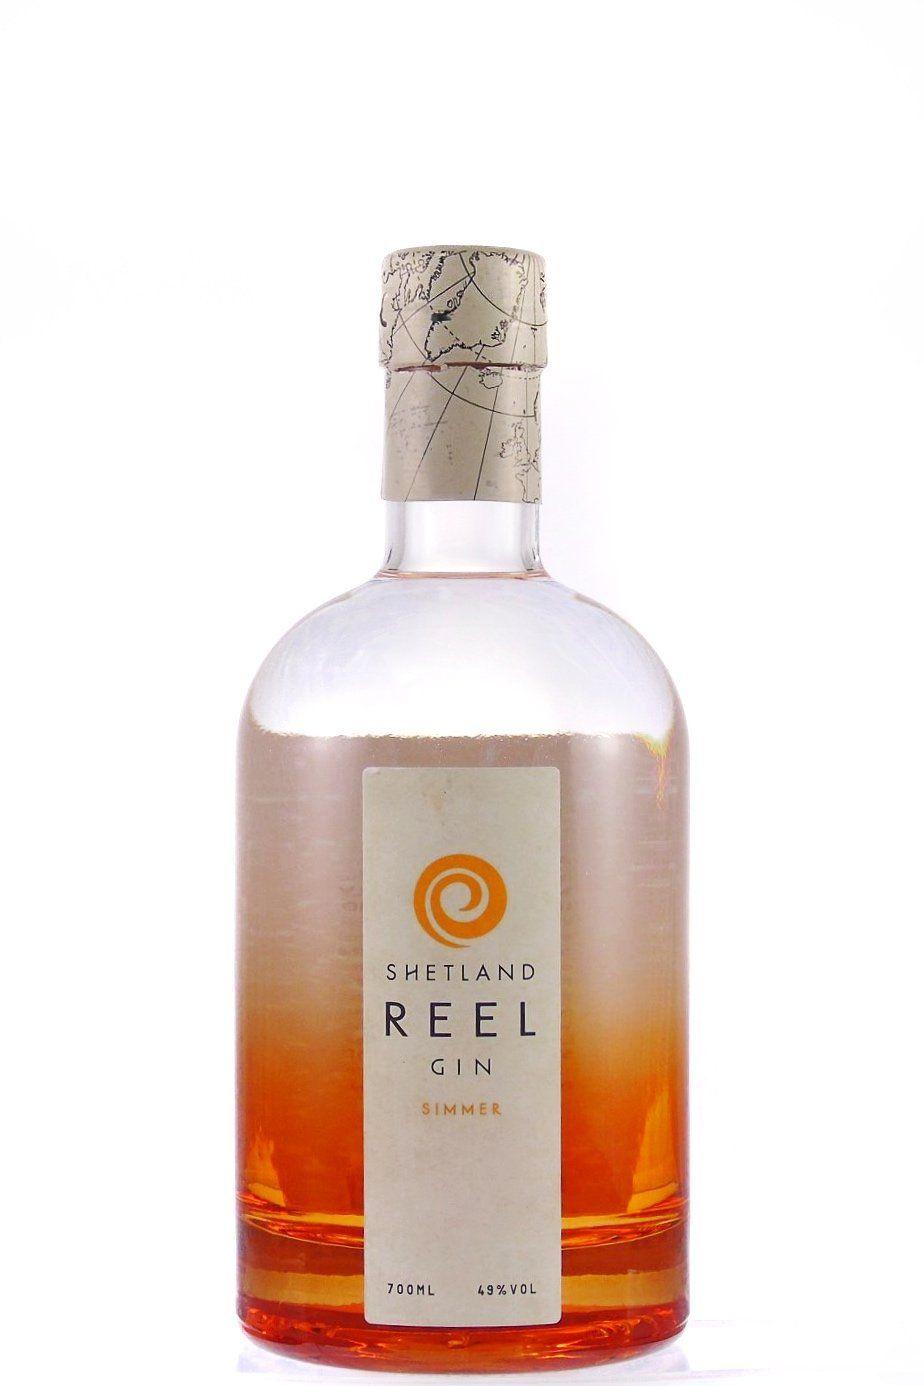 Shetland Reel Simmer Gin Gins & Gin Liqueurs